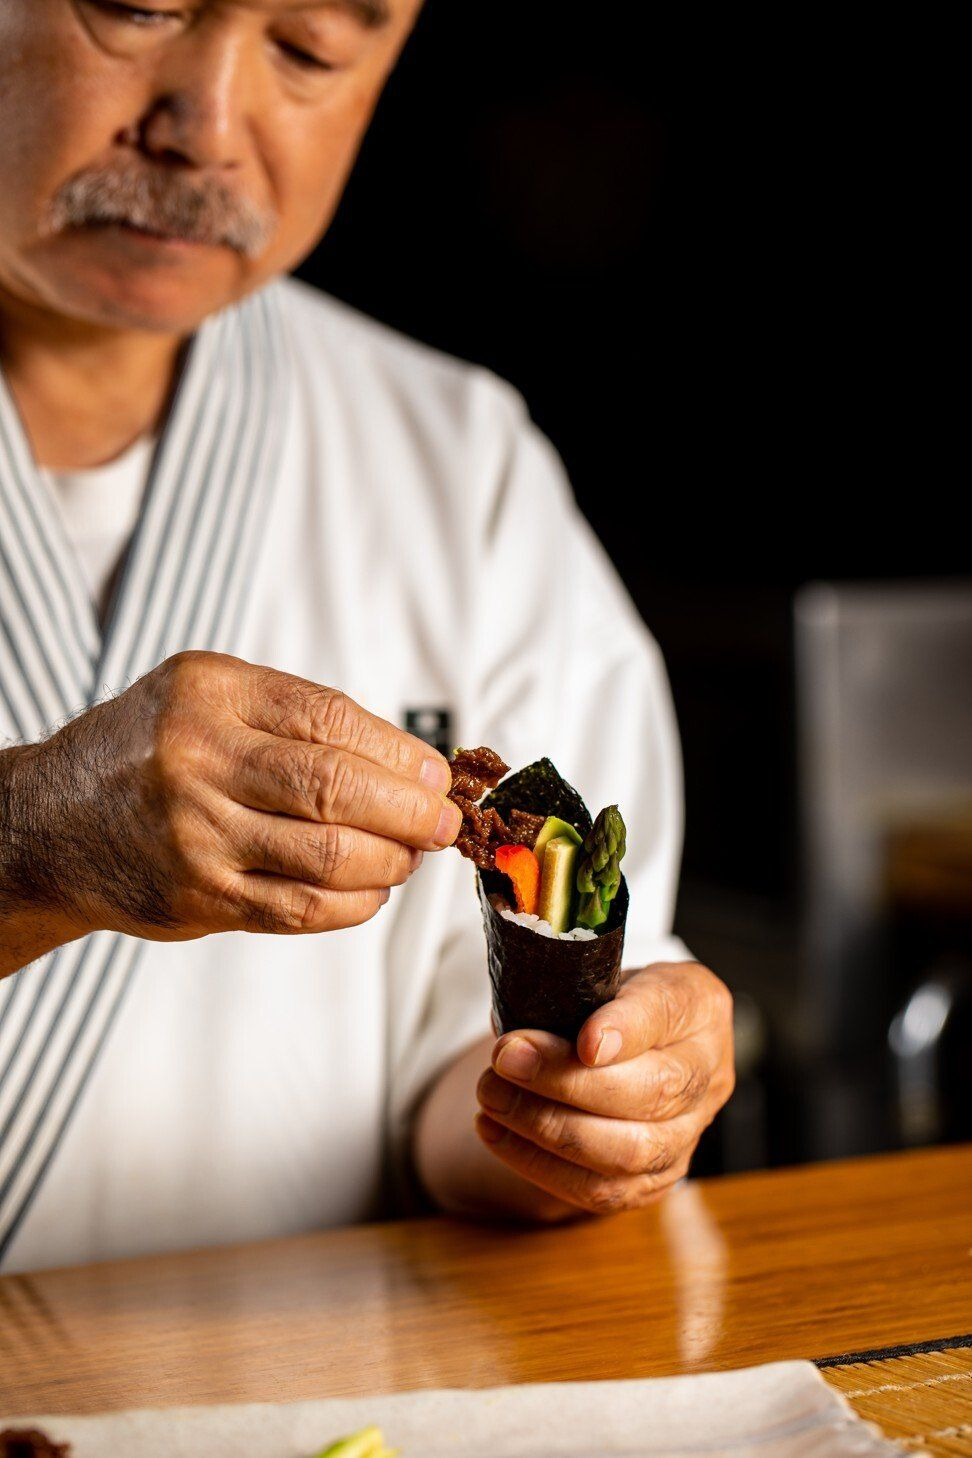 Sejarah Kikkoman, Merek Kecap Jepang Sejak 1917 yang Mendunia